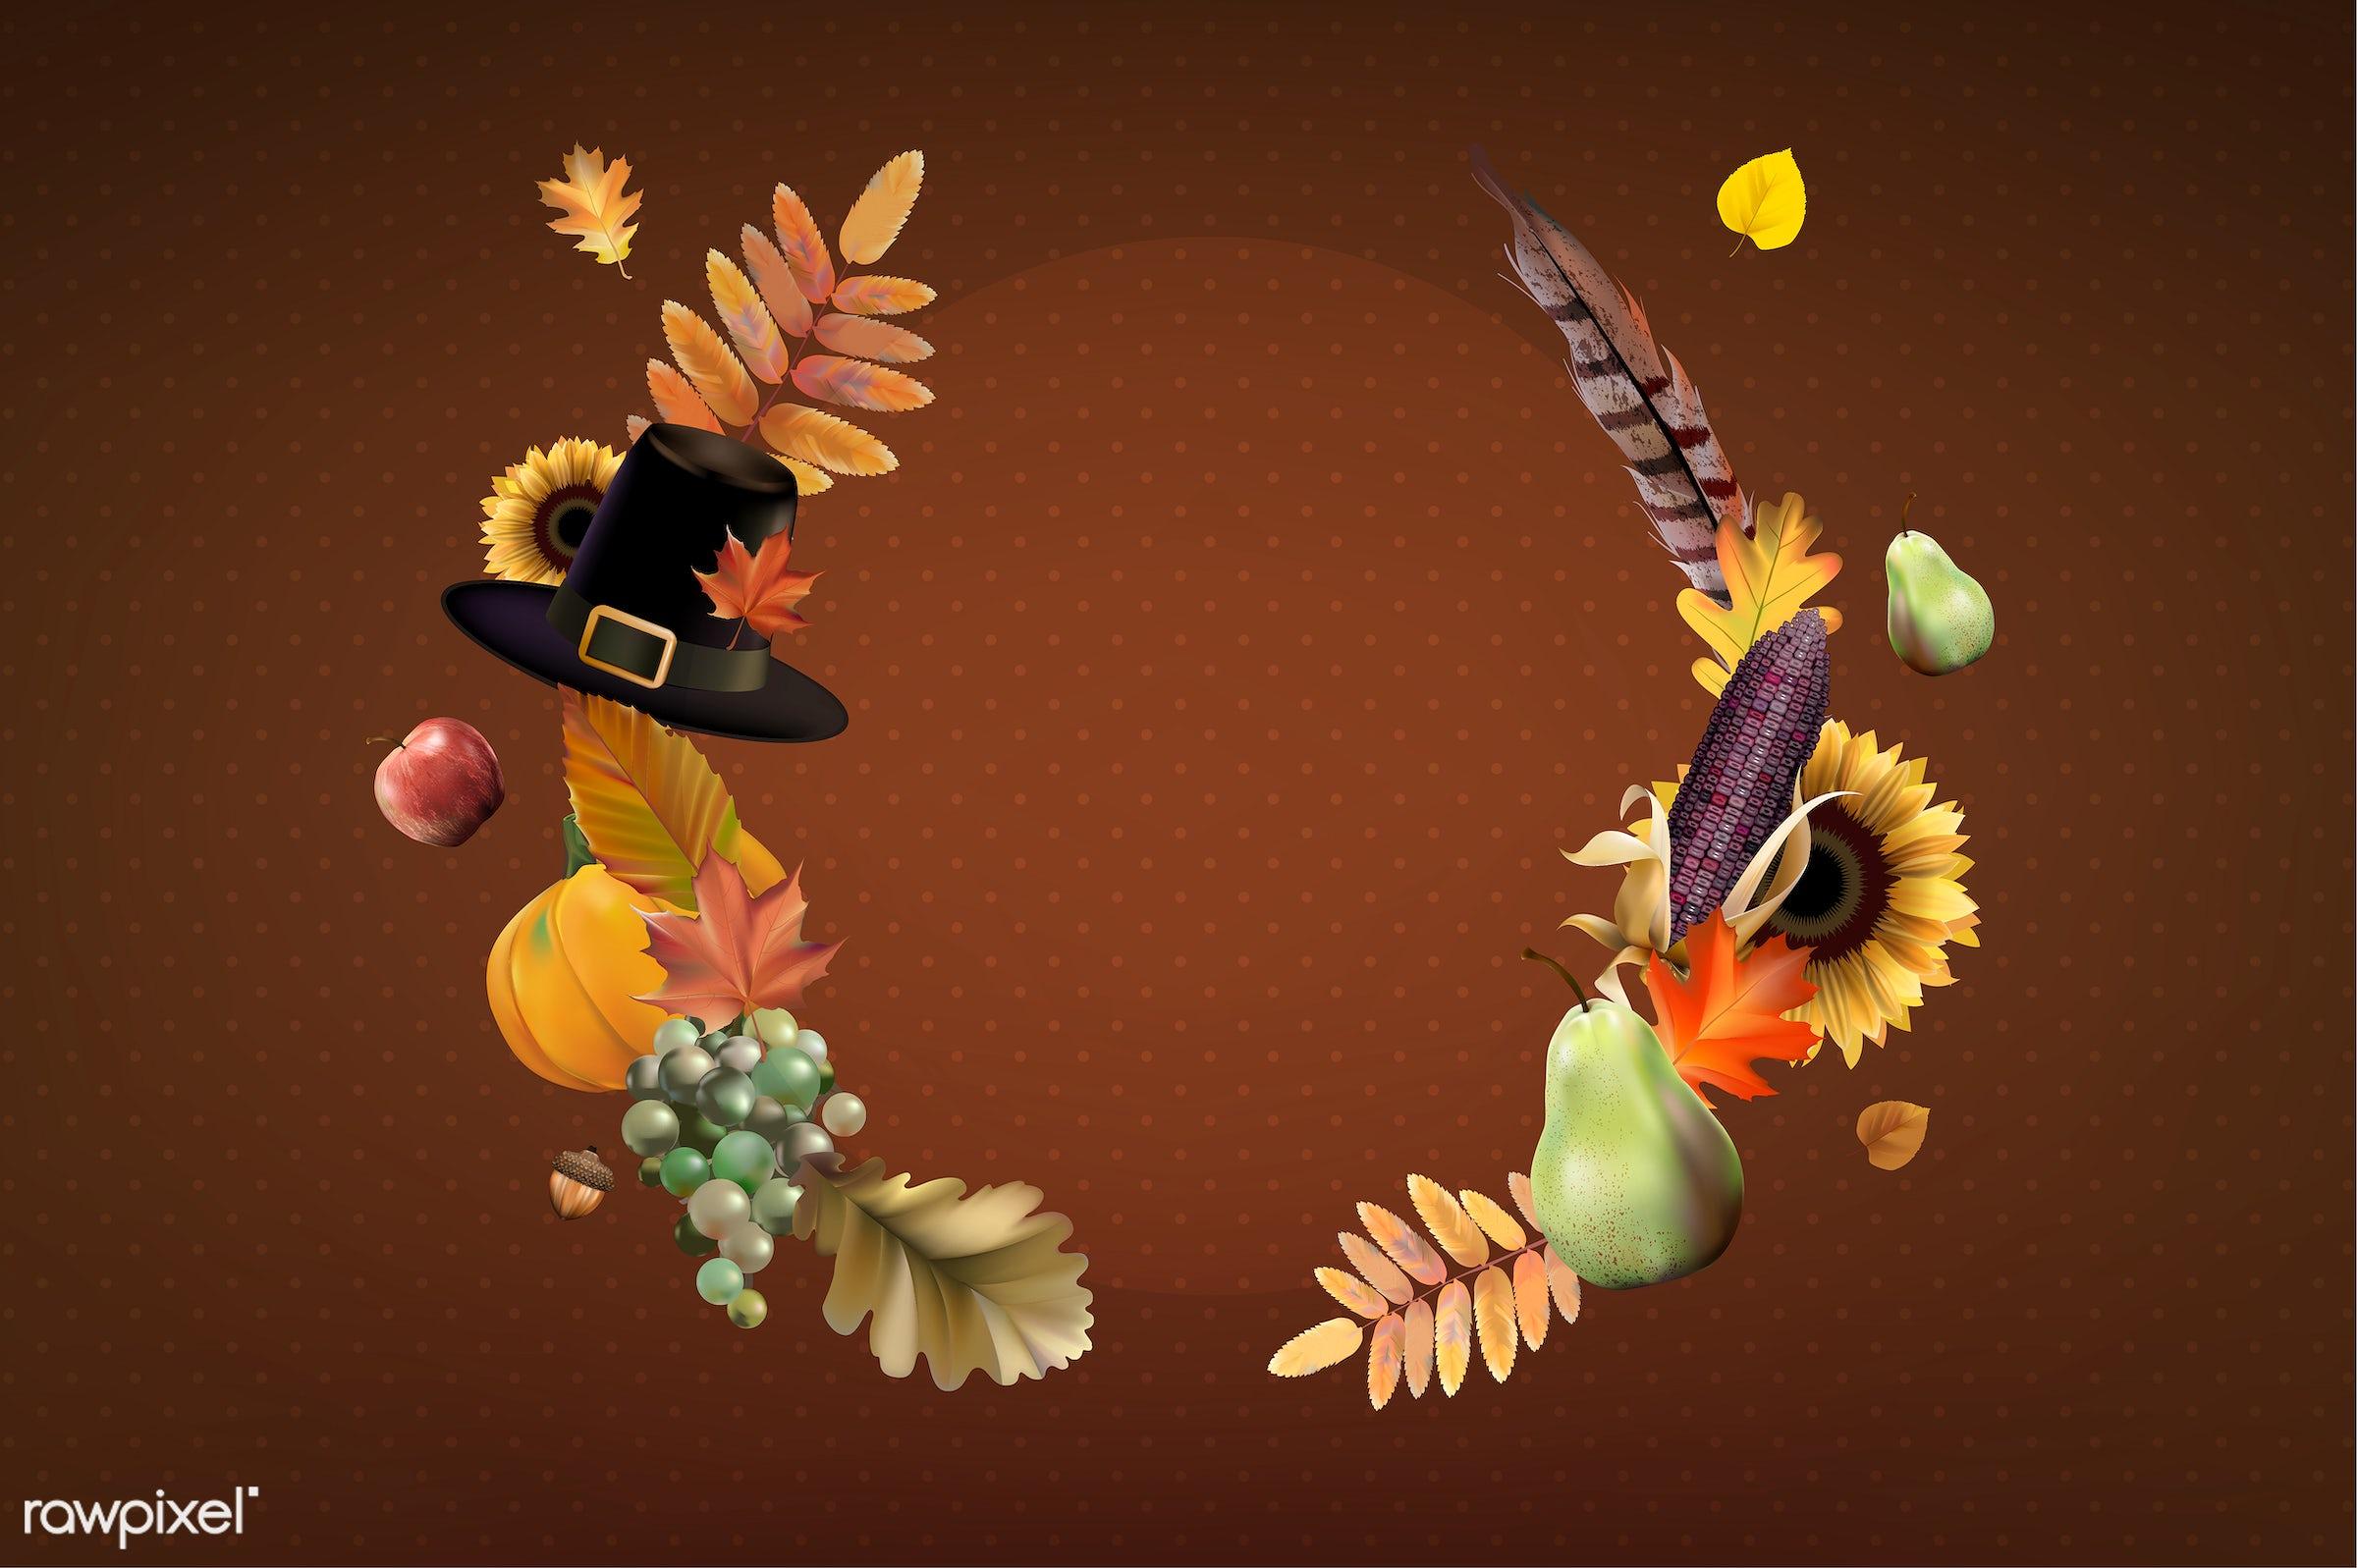 Illustration of thanksgiving festival - fall, autumn, background, banner, celebration, copy space, crops, decoration, design...